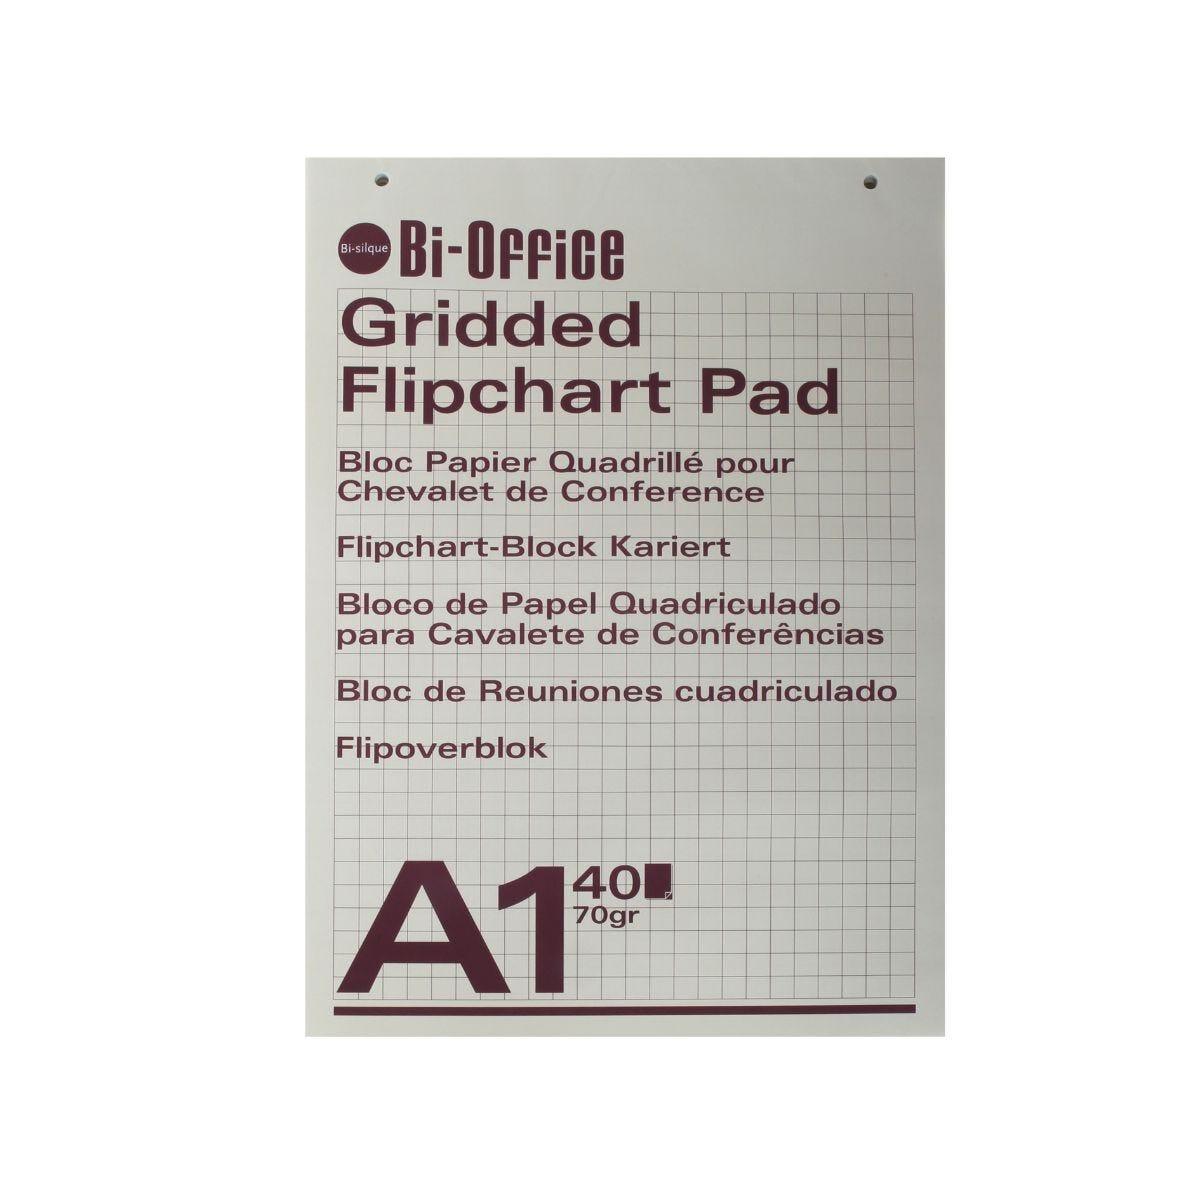 Bi-Office Gridded Flip Chart Pad A1 40 Sheet Pack of 5